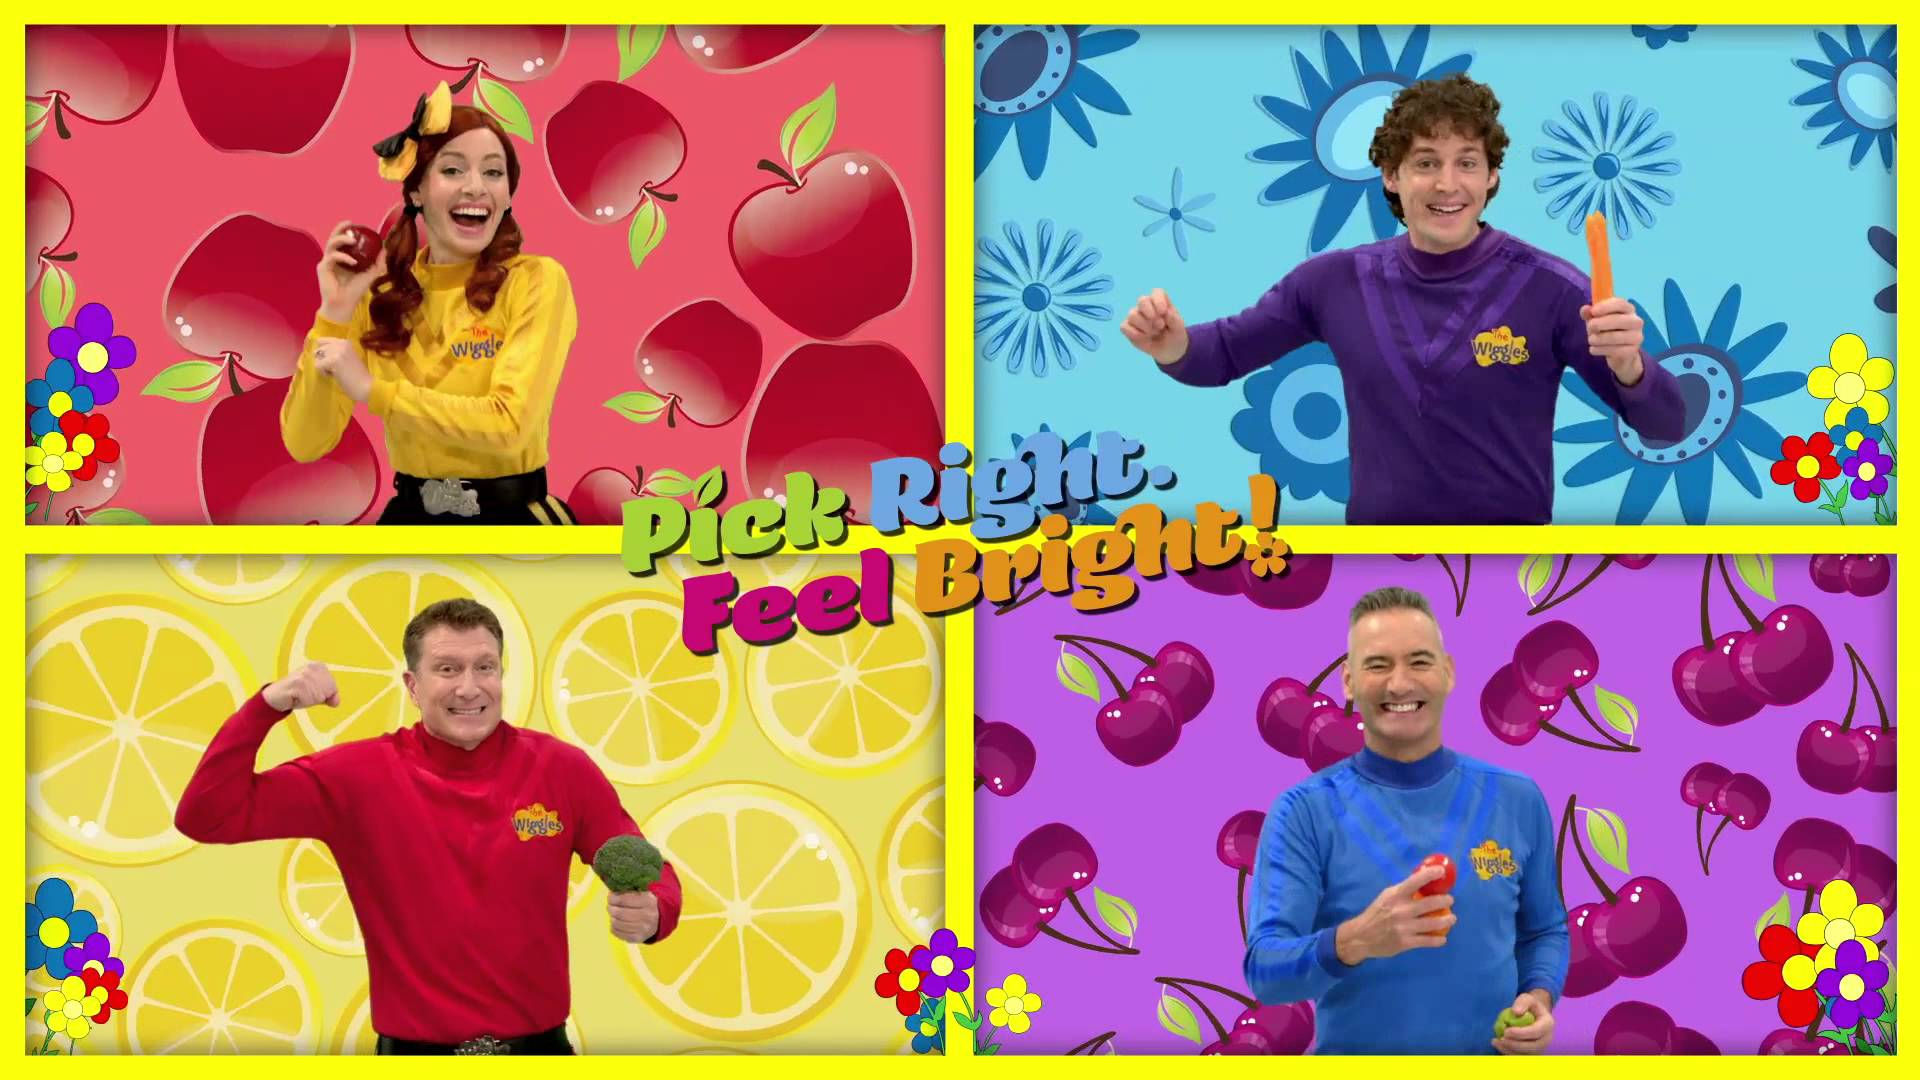 Pick Right, Feel Bright!